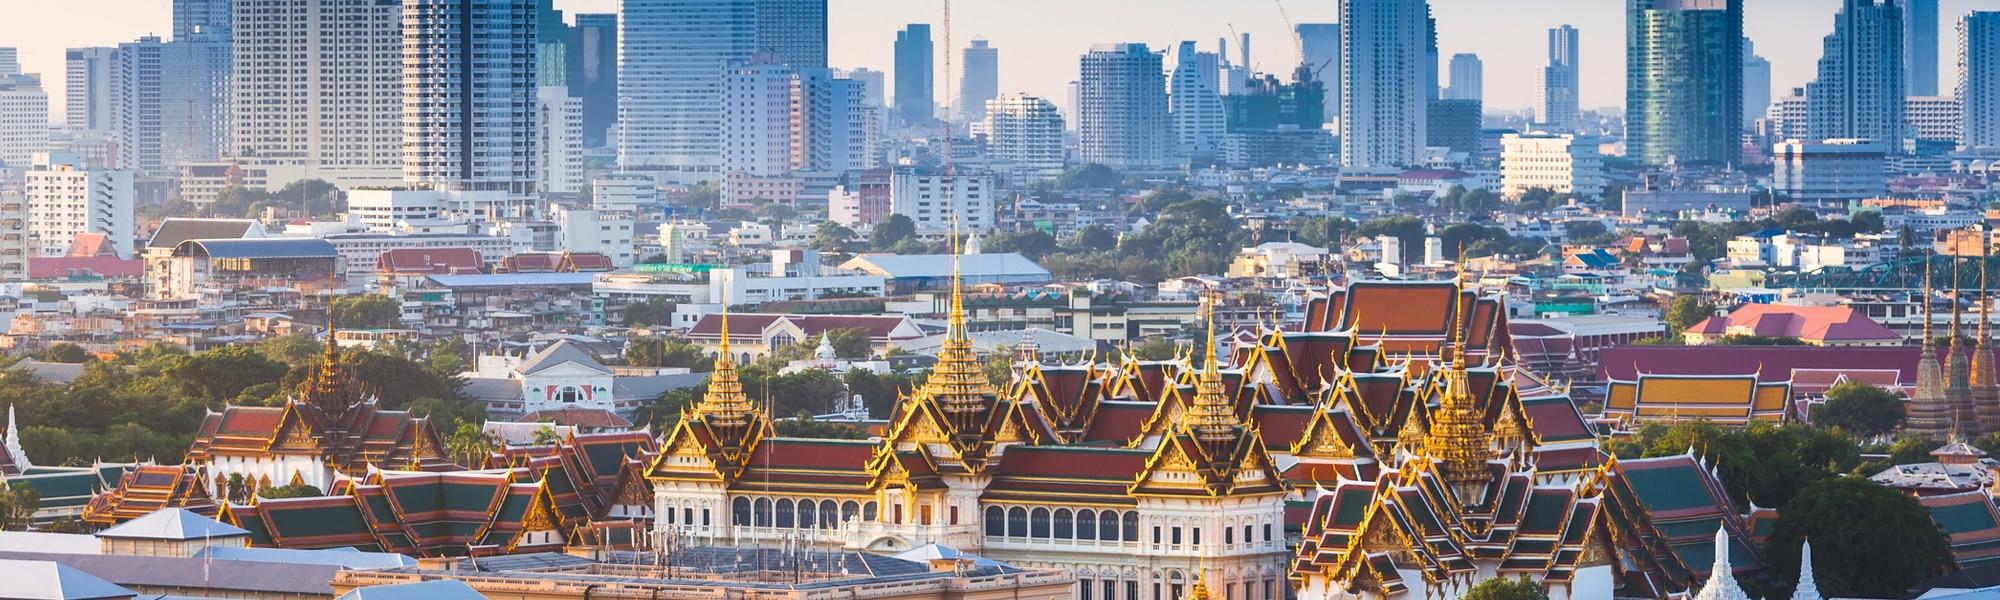 Bangkok & Pattaya- Cities that never sleep!